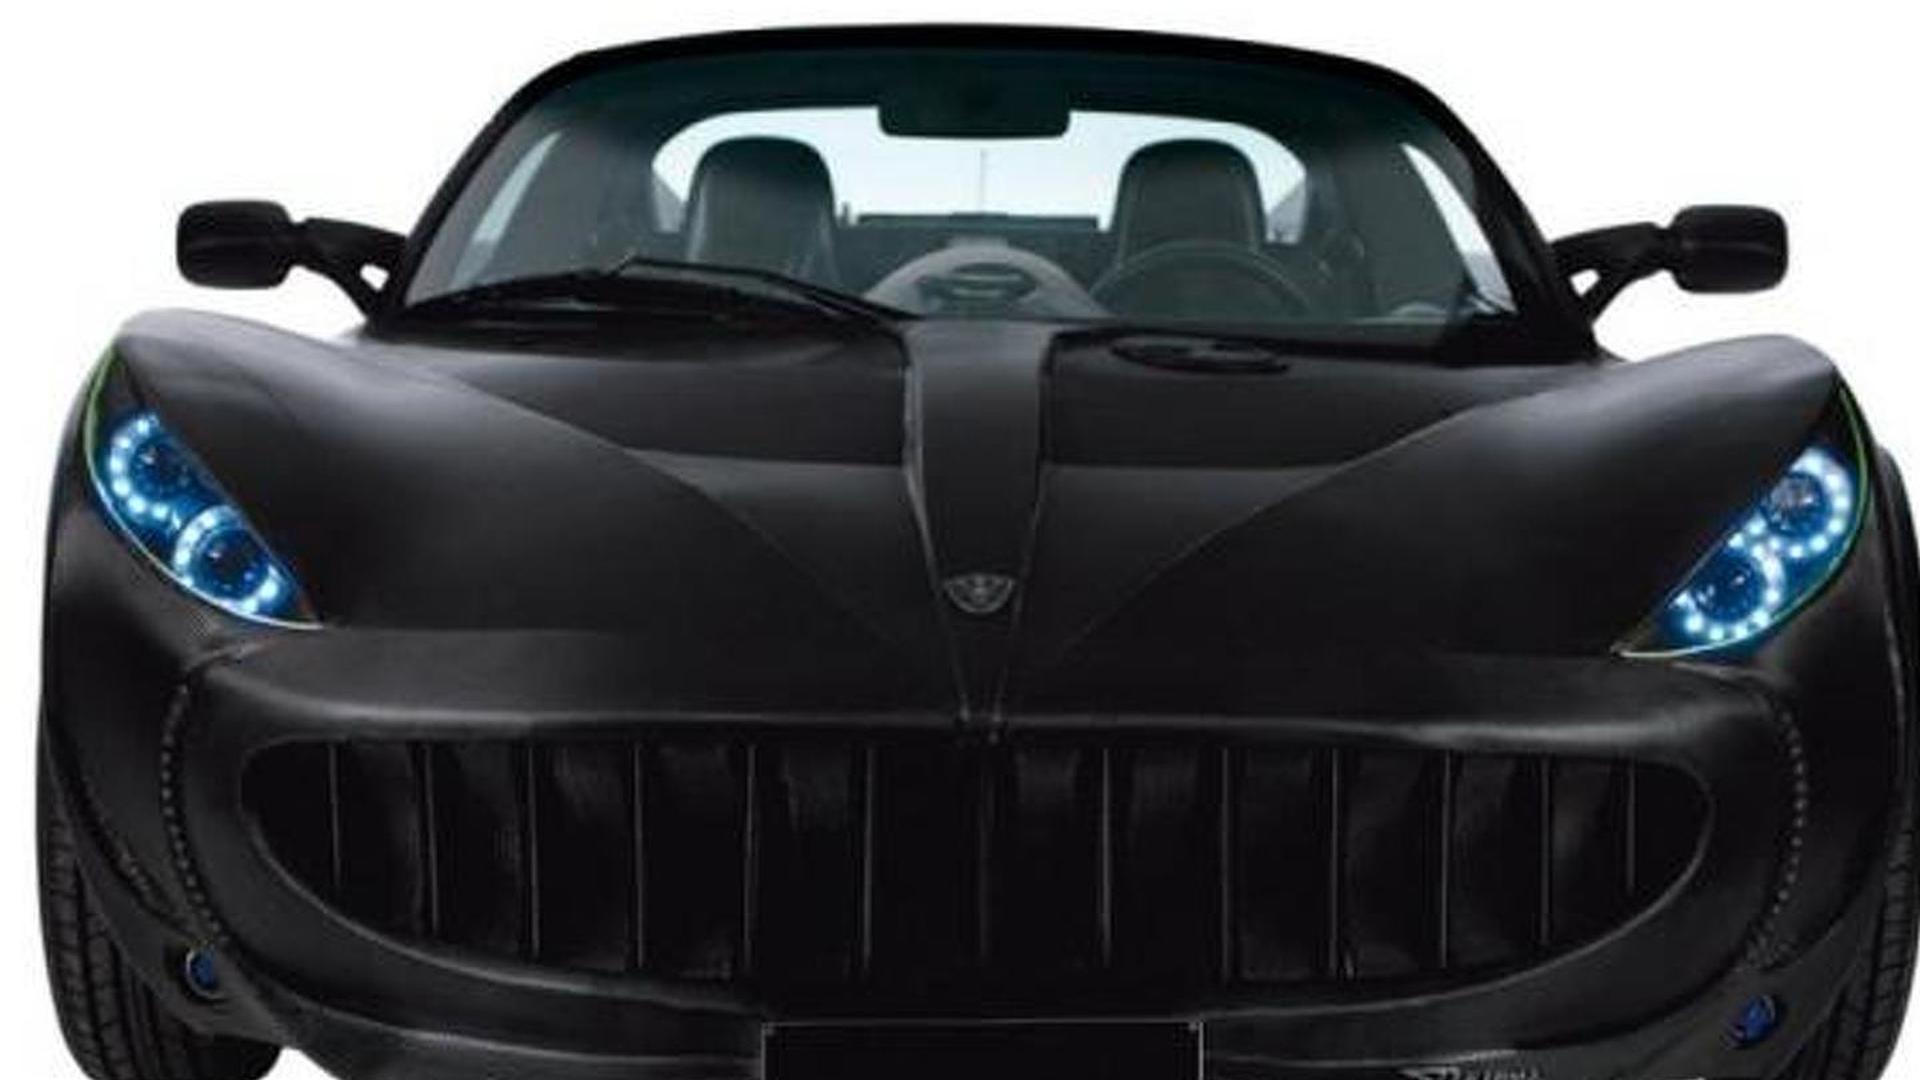 PG Elektrus picks up where the Tesla Roadster left off